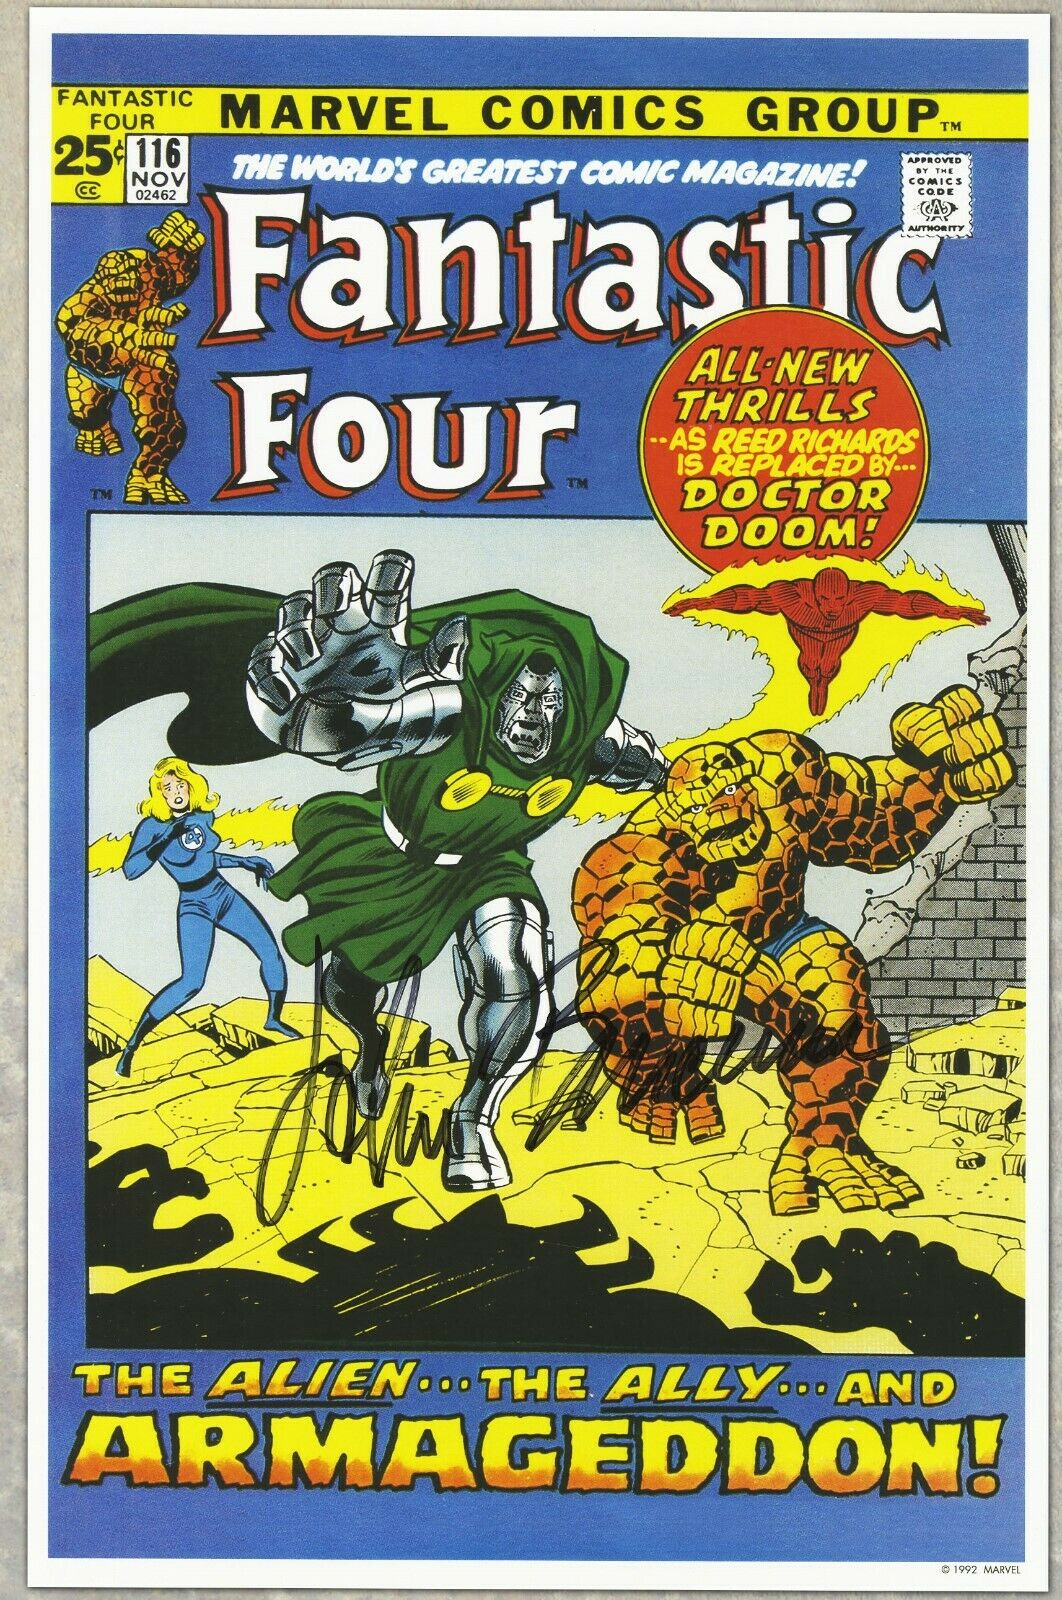 Fantastic Four 116 John Buscema Autographed Signed POSTER 11 X 17 Doctor Doom - $21.00